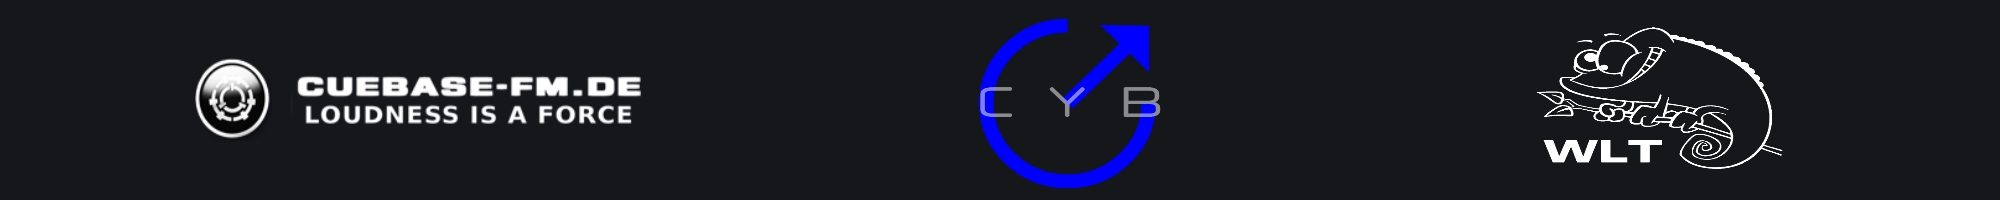 DJ CYB